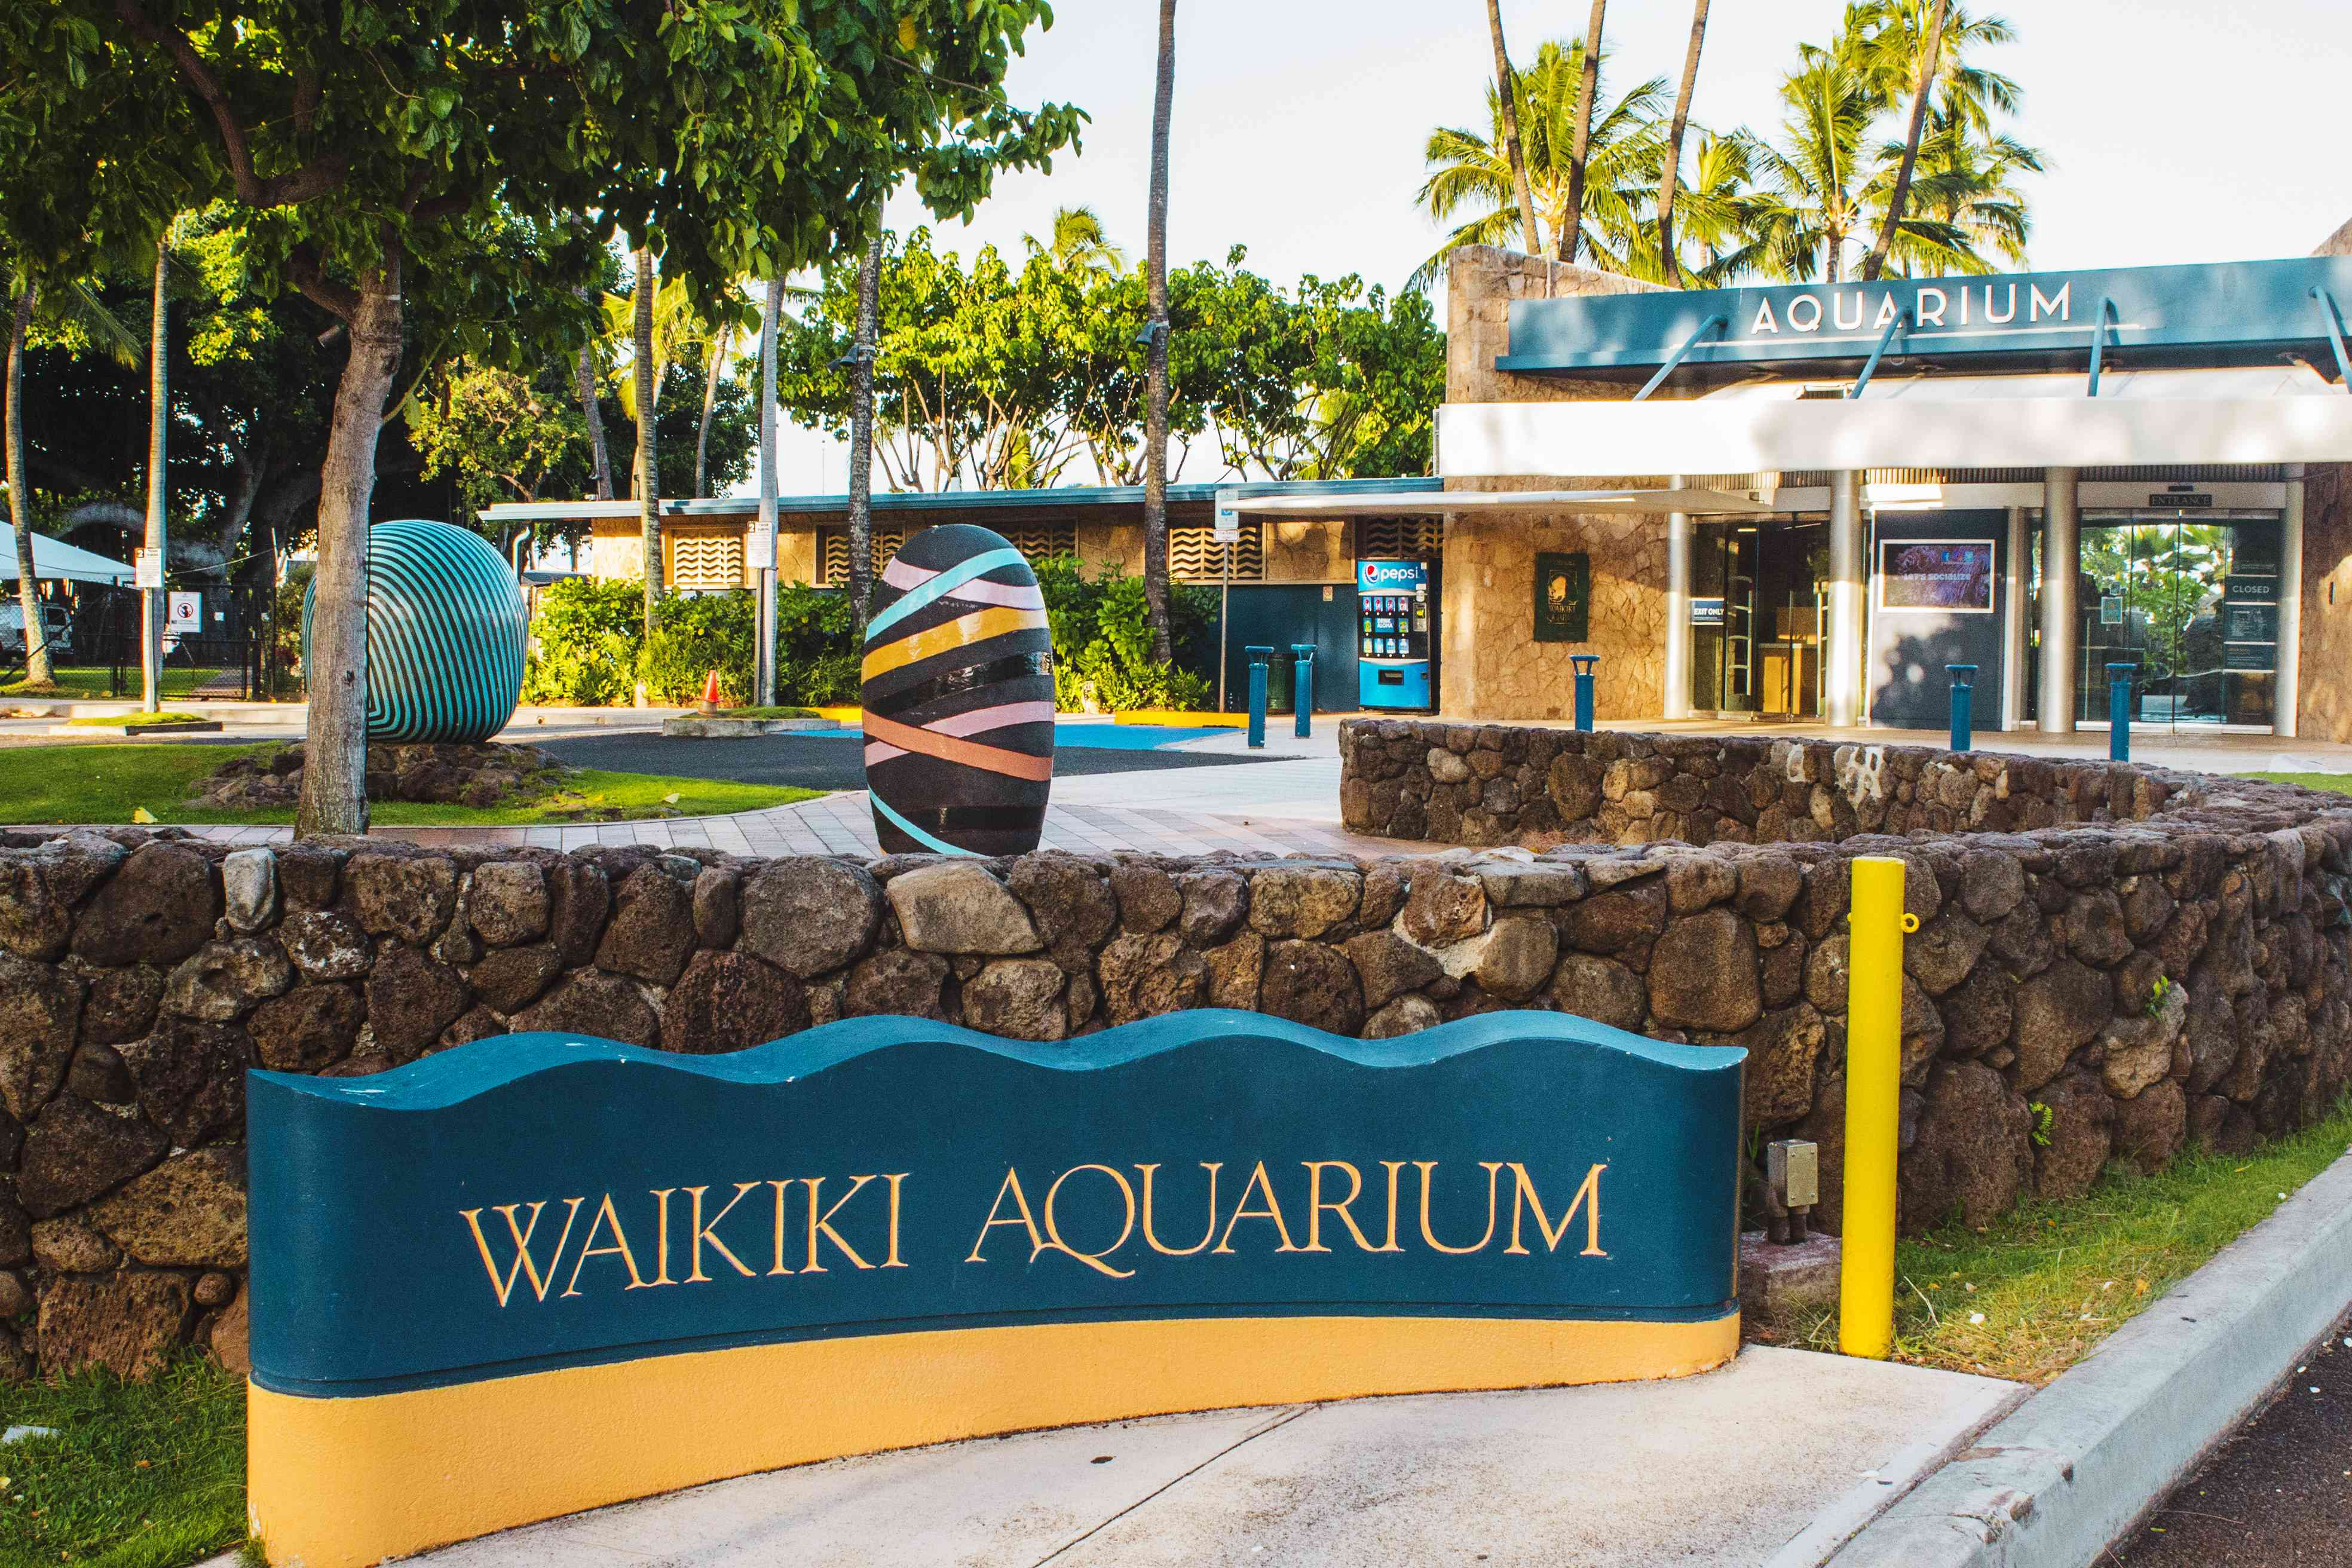 Sign and entrance for the Waikiki Aquarium